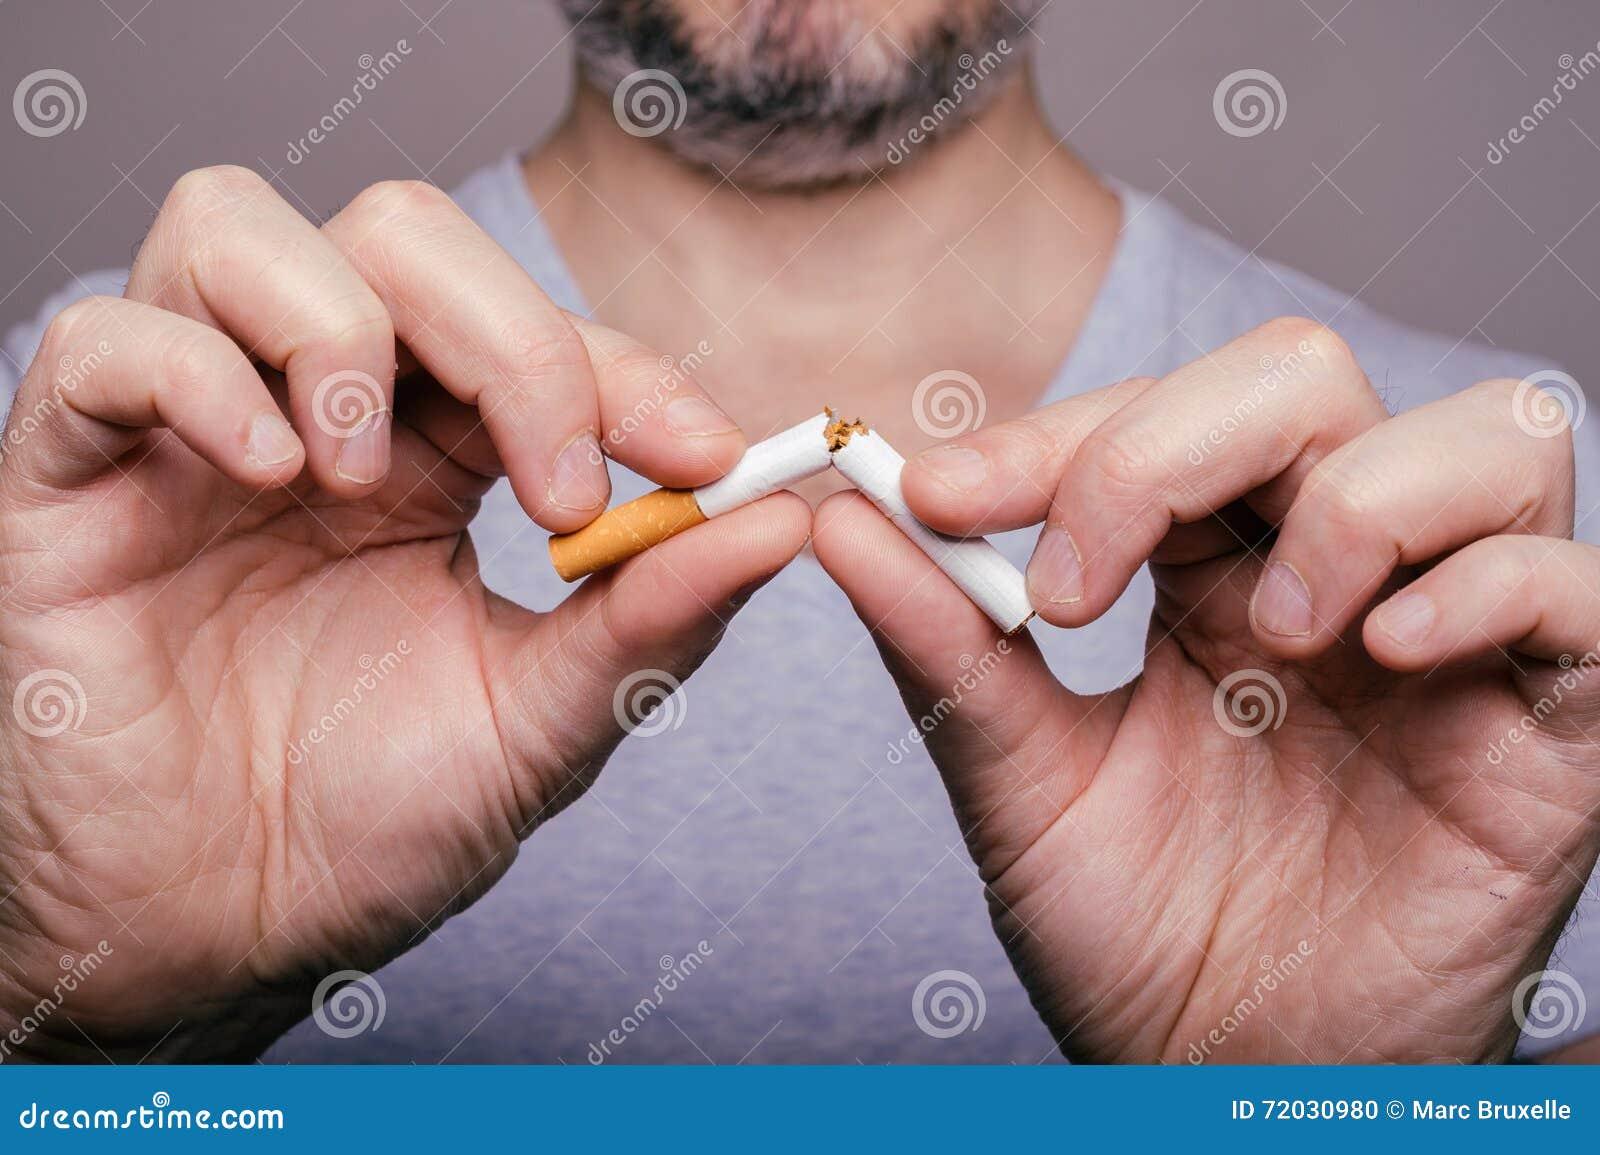 Salga la imagen antifumador rendida Smoking